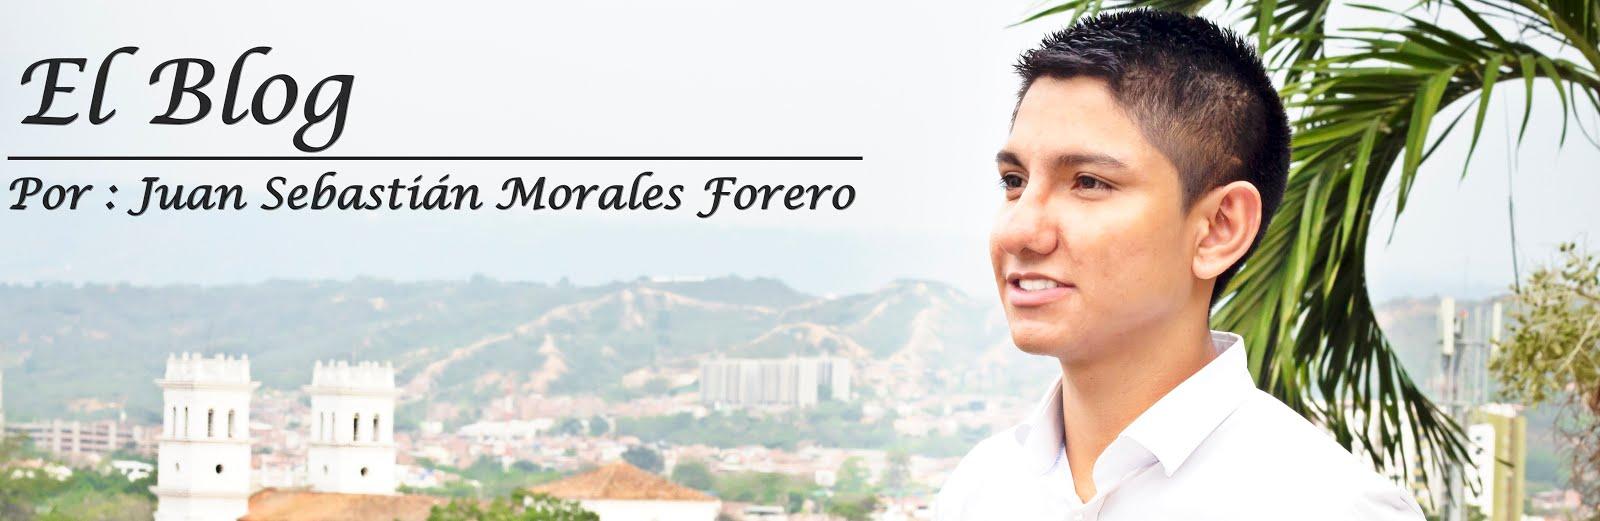 Juan Sebastián Morales Forero